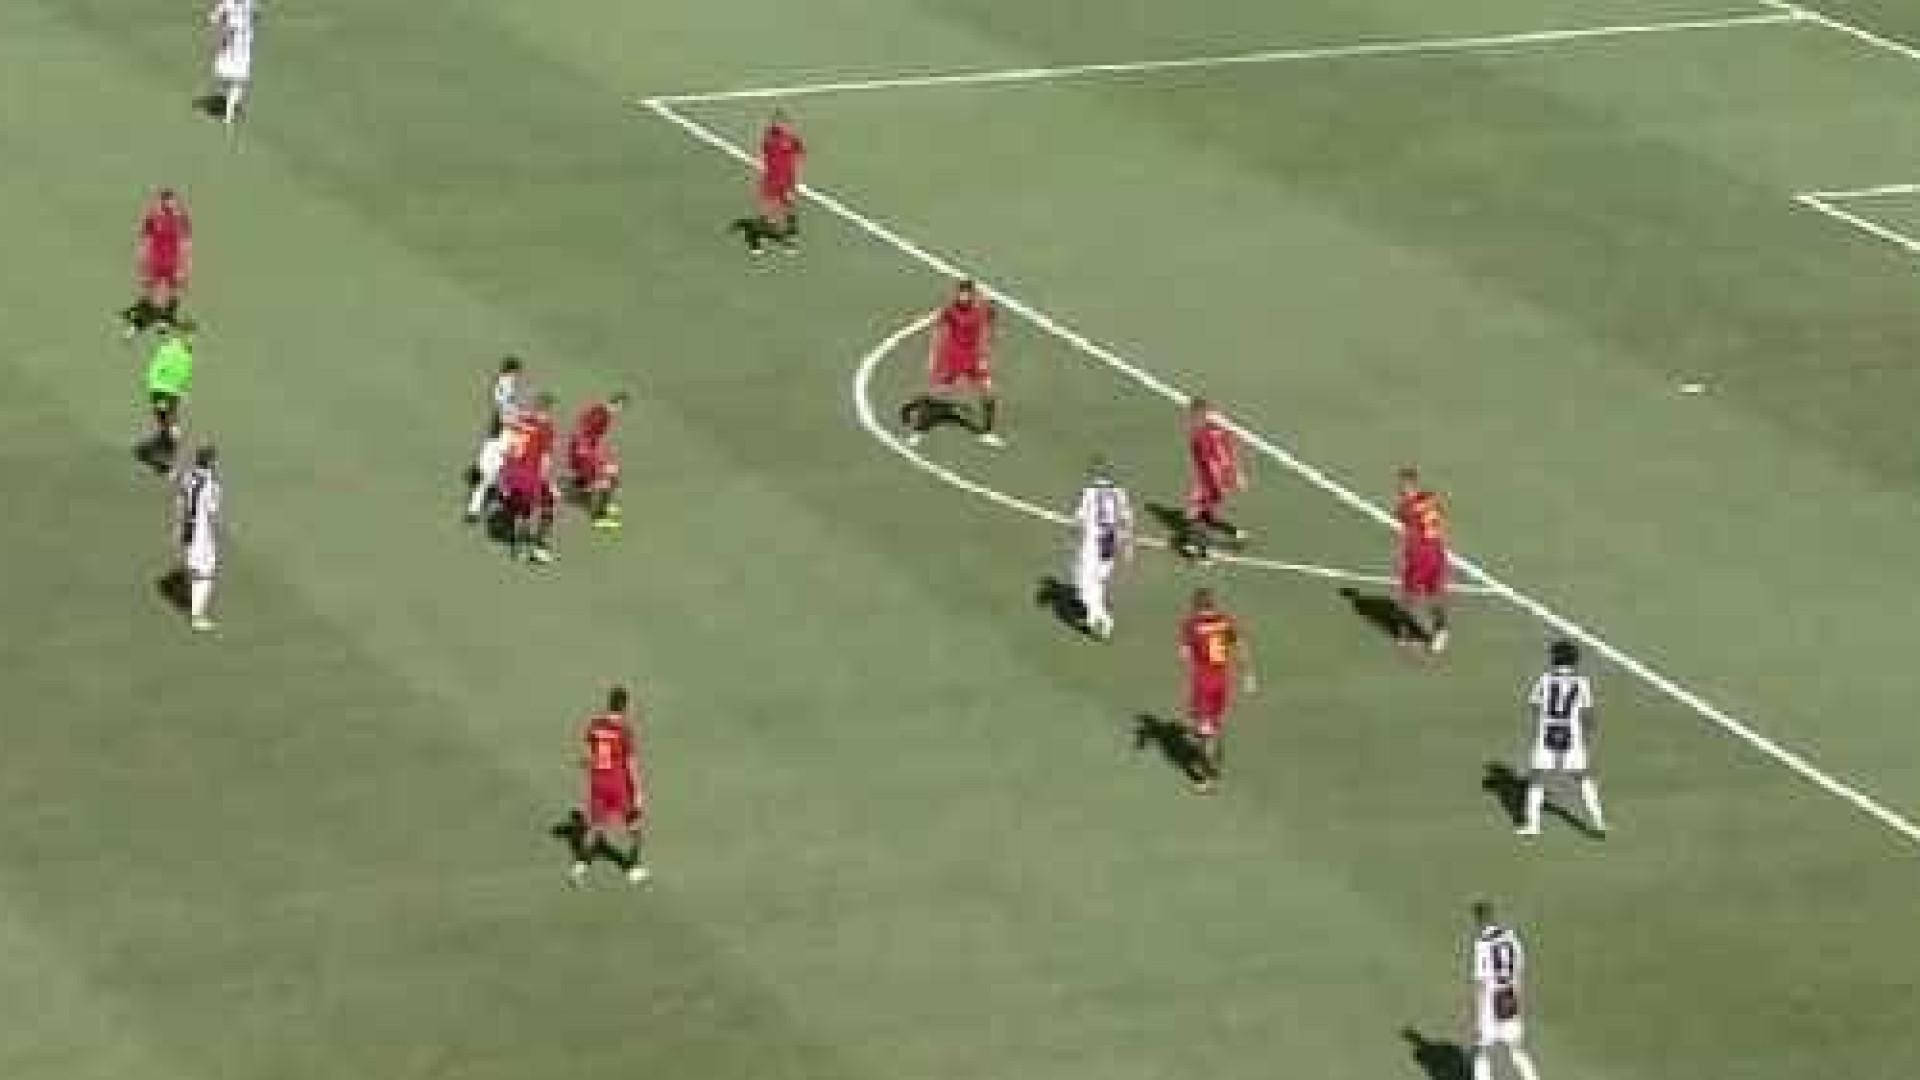 Dybala fez isto e Nainggolan ainda deve estar à procura da bola